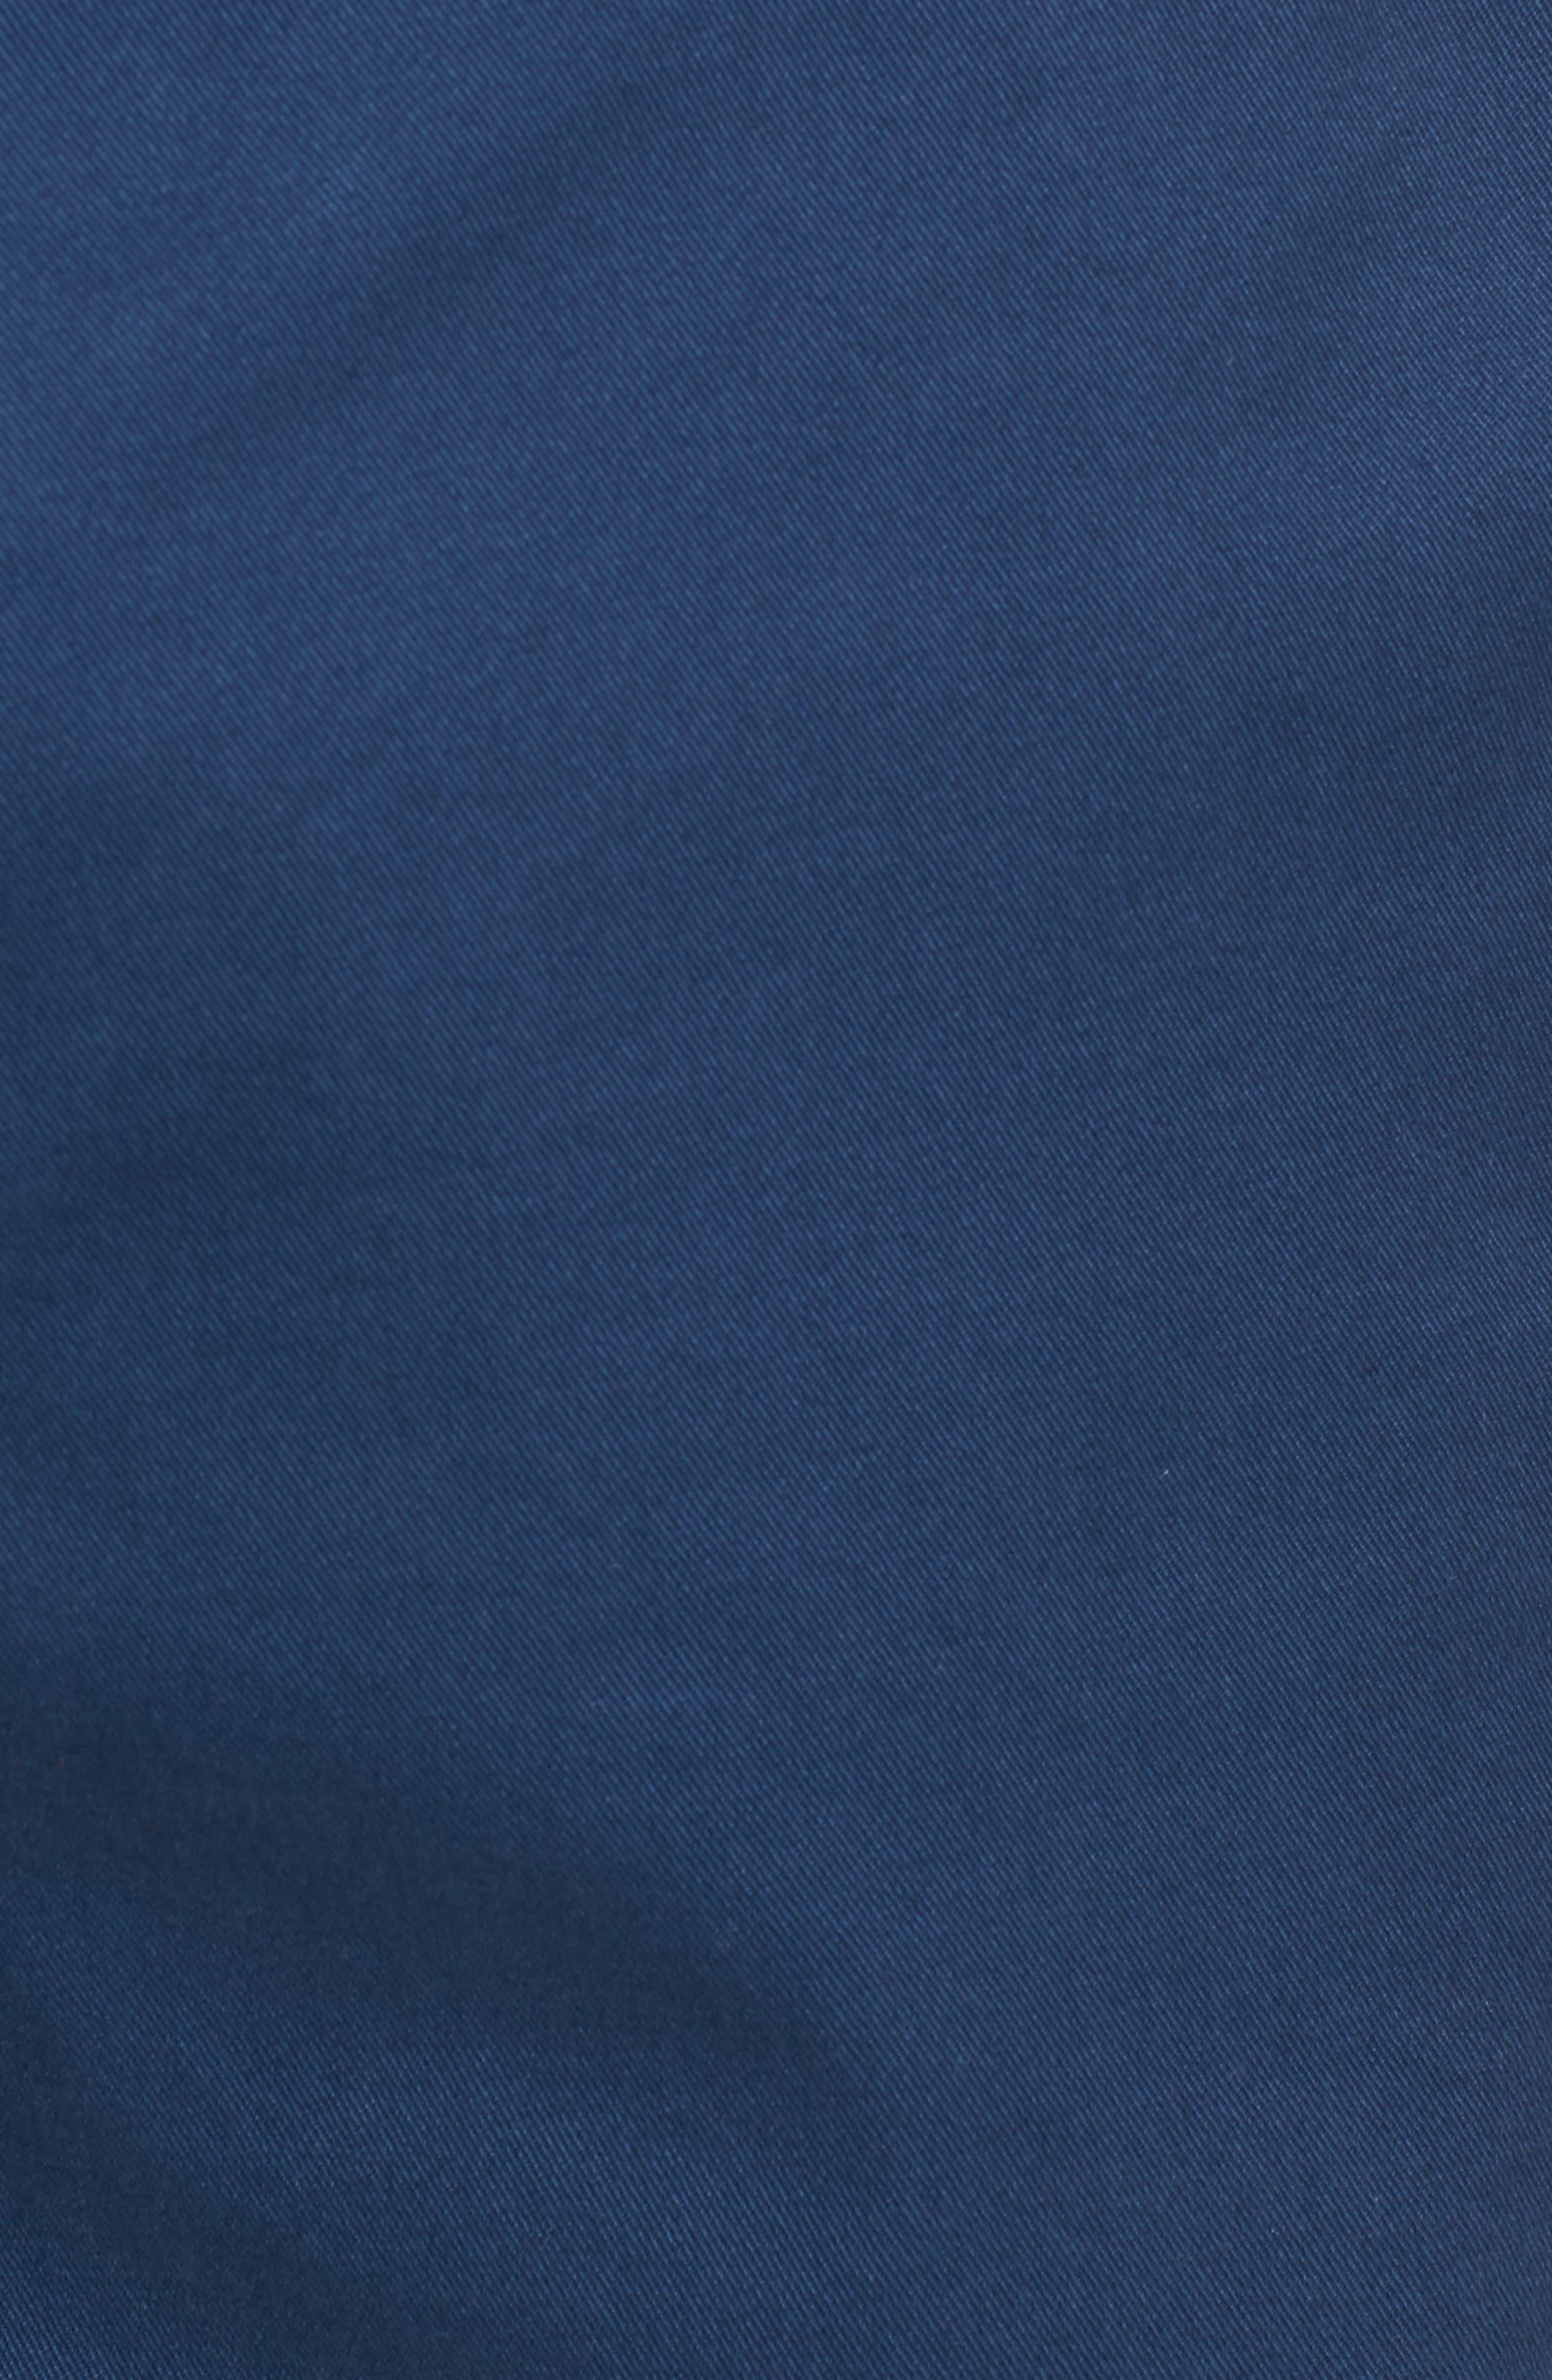 Proshor Slim Fit Chino Shorts,                             Alternate thumbnail 8, color,                             Dark Blue